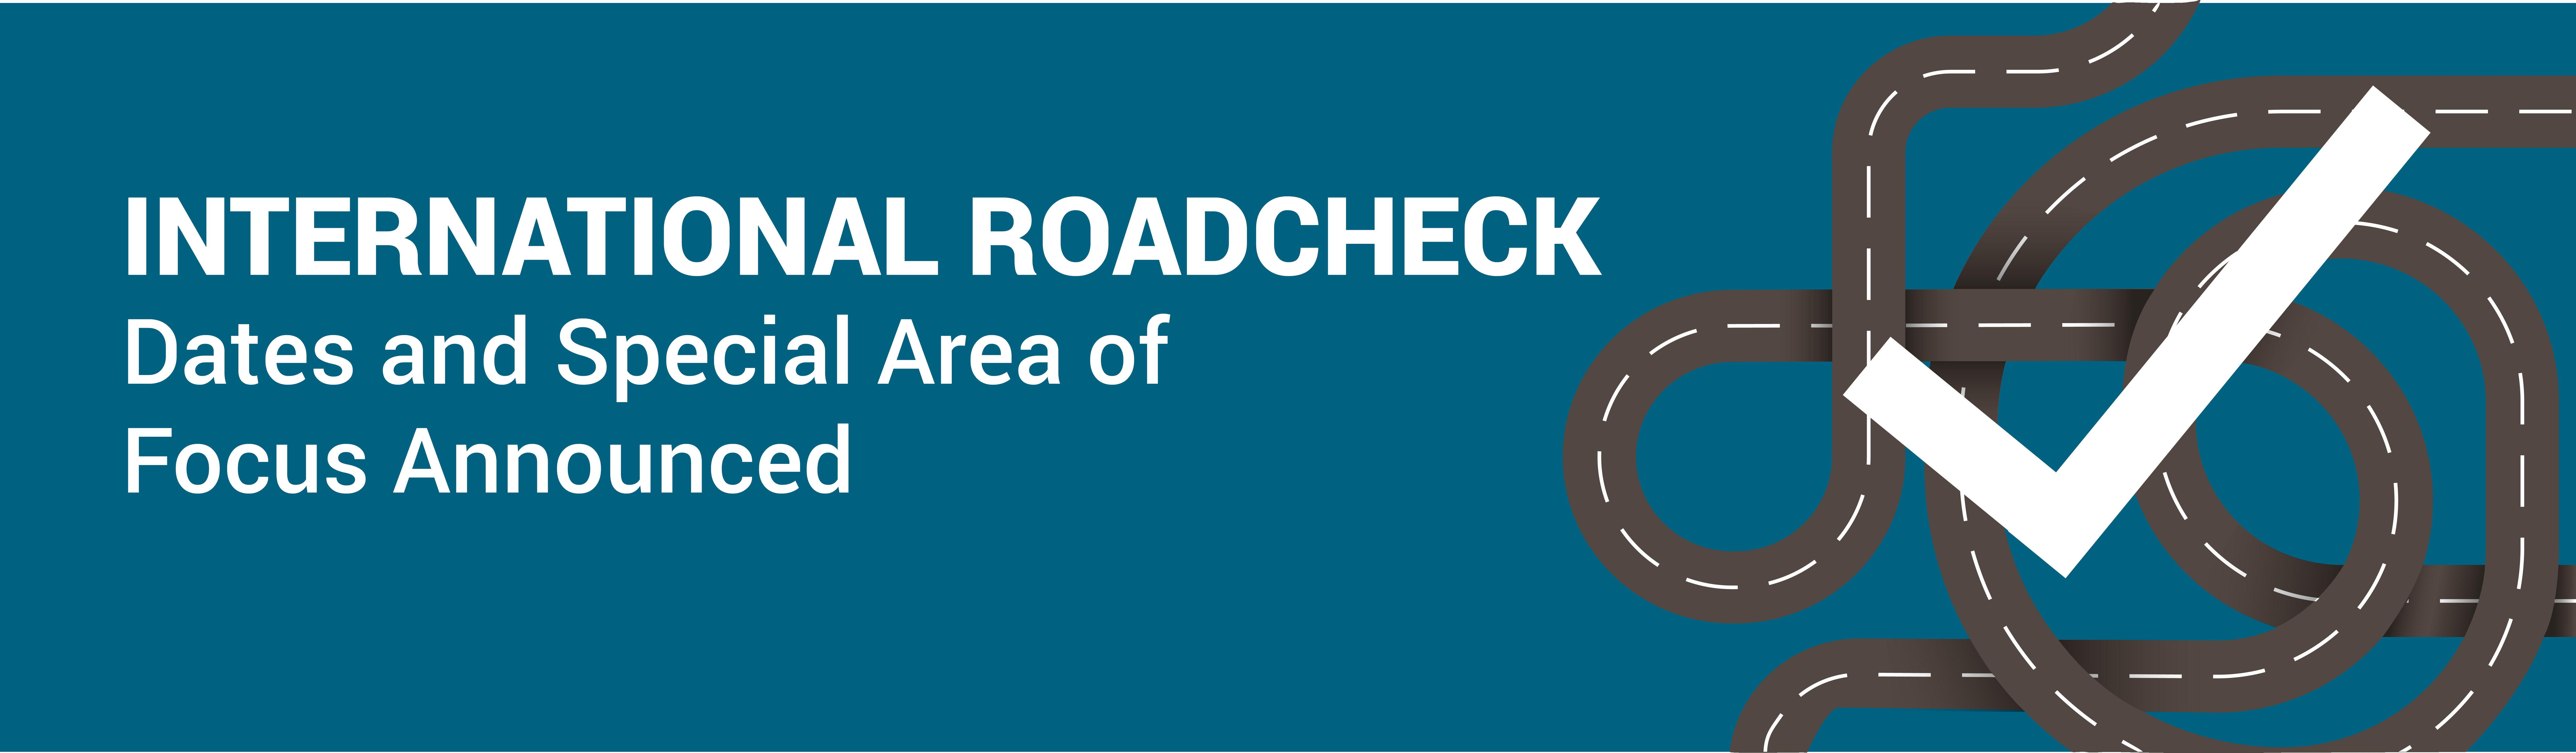 International Roadcheck 2018